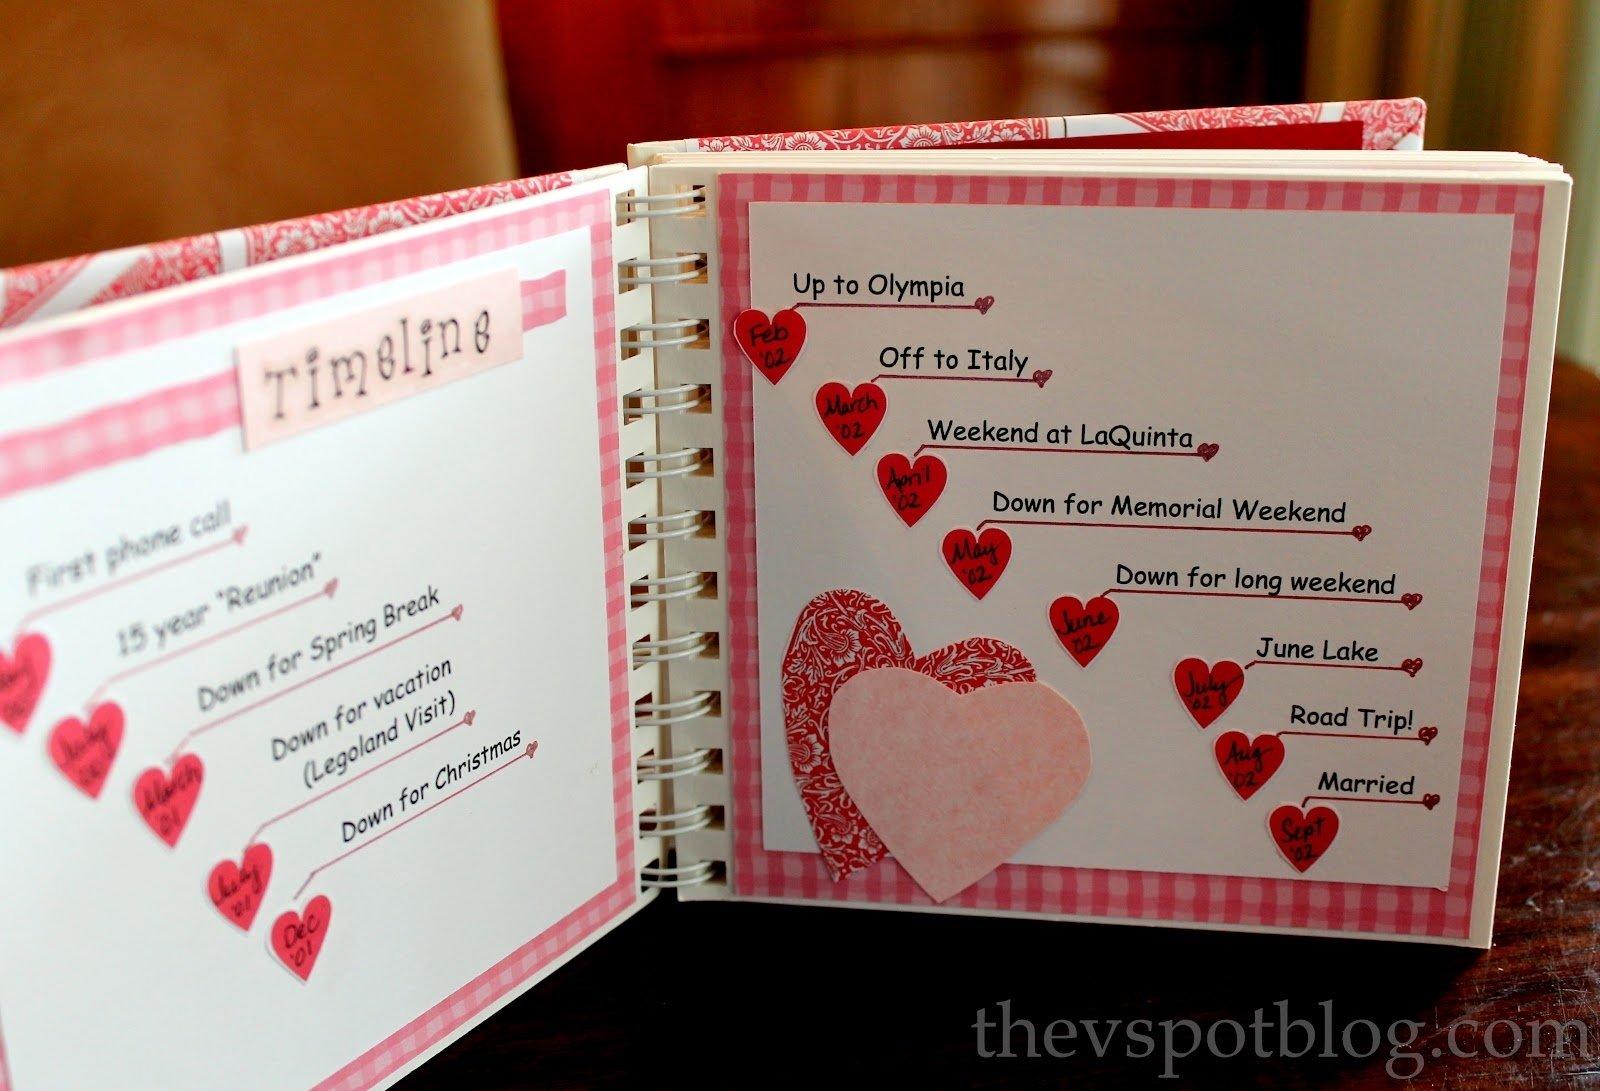 10 Stylish Cute Valentines Ideas For Boyfriend valentine day new creative ideas boyfriend husband him home art 21 2020